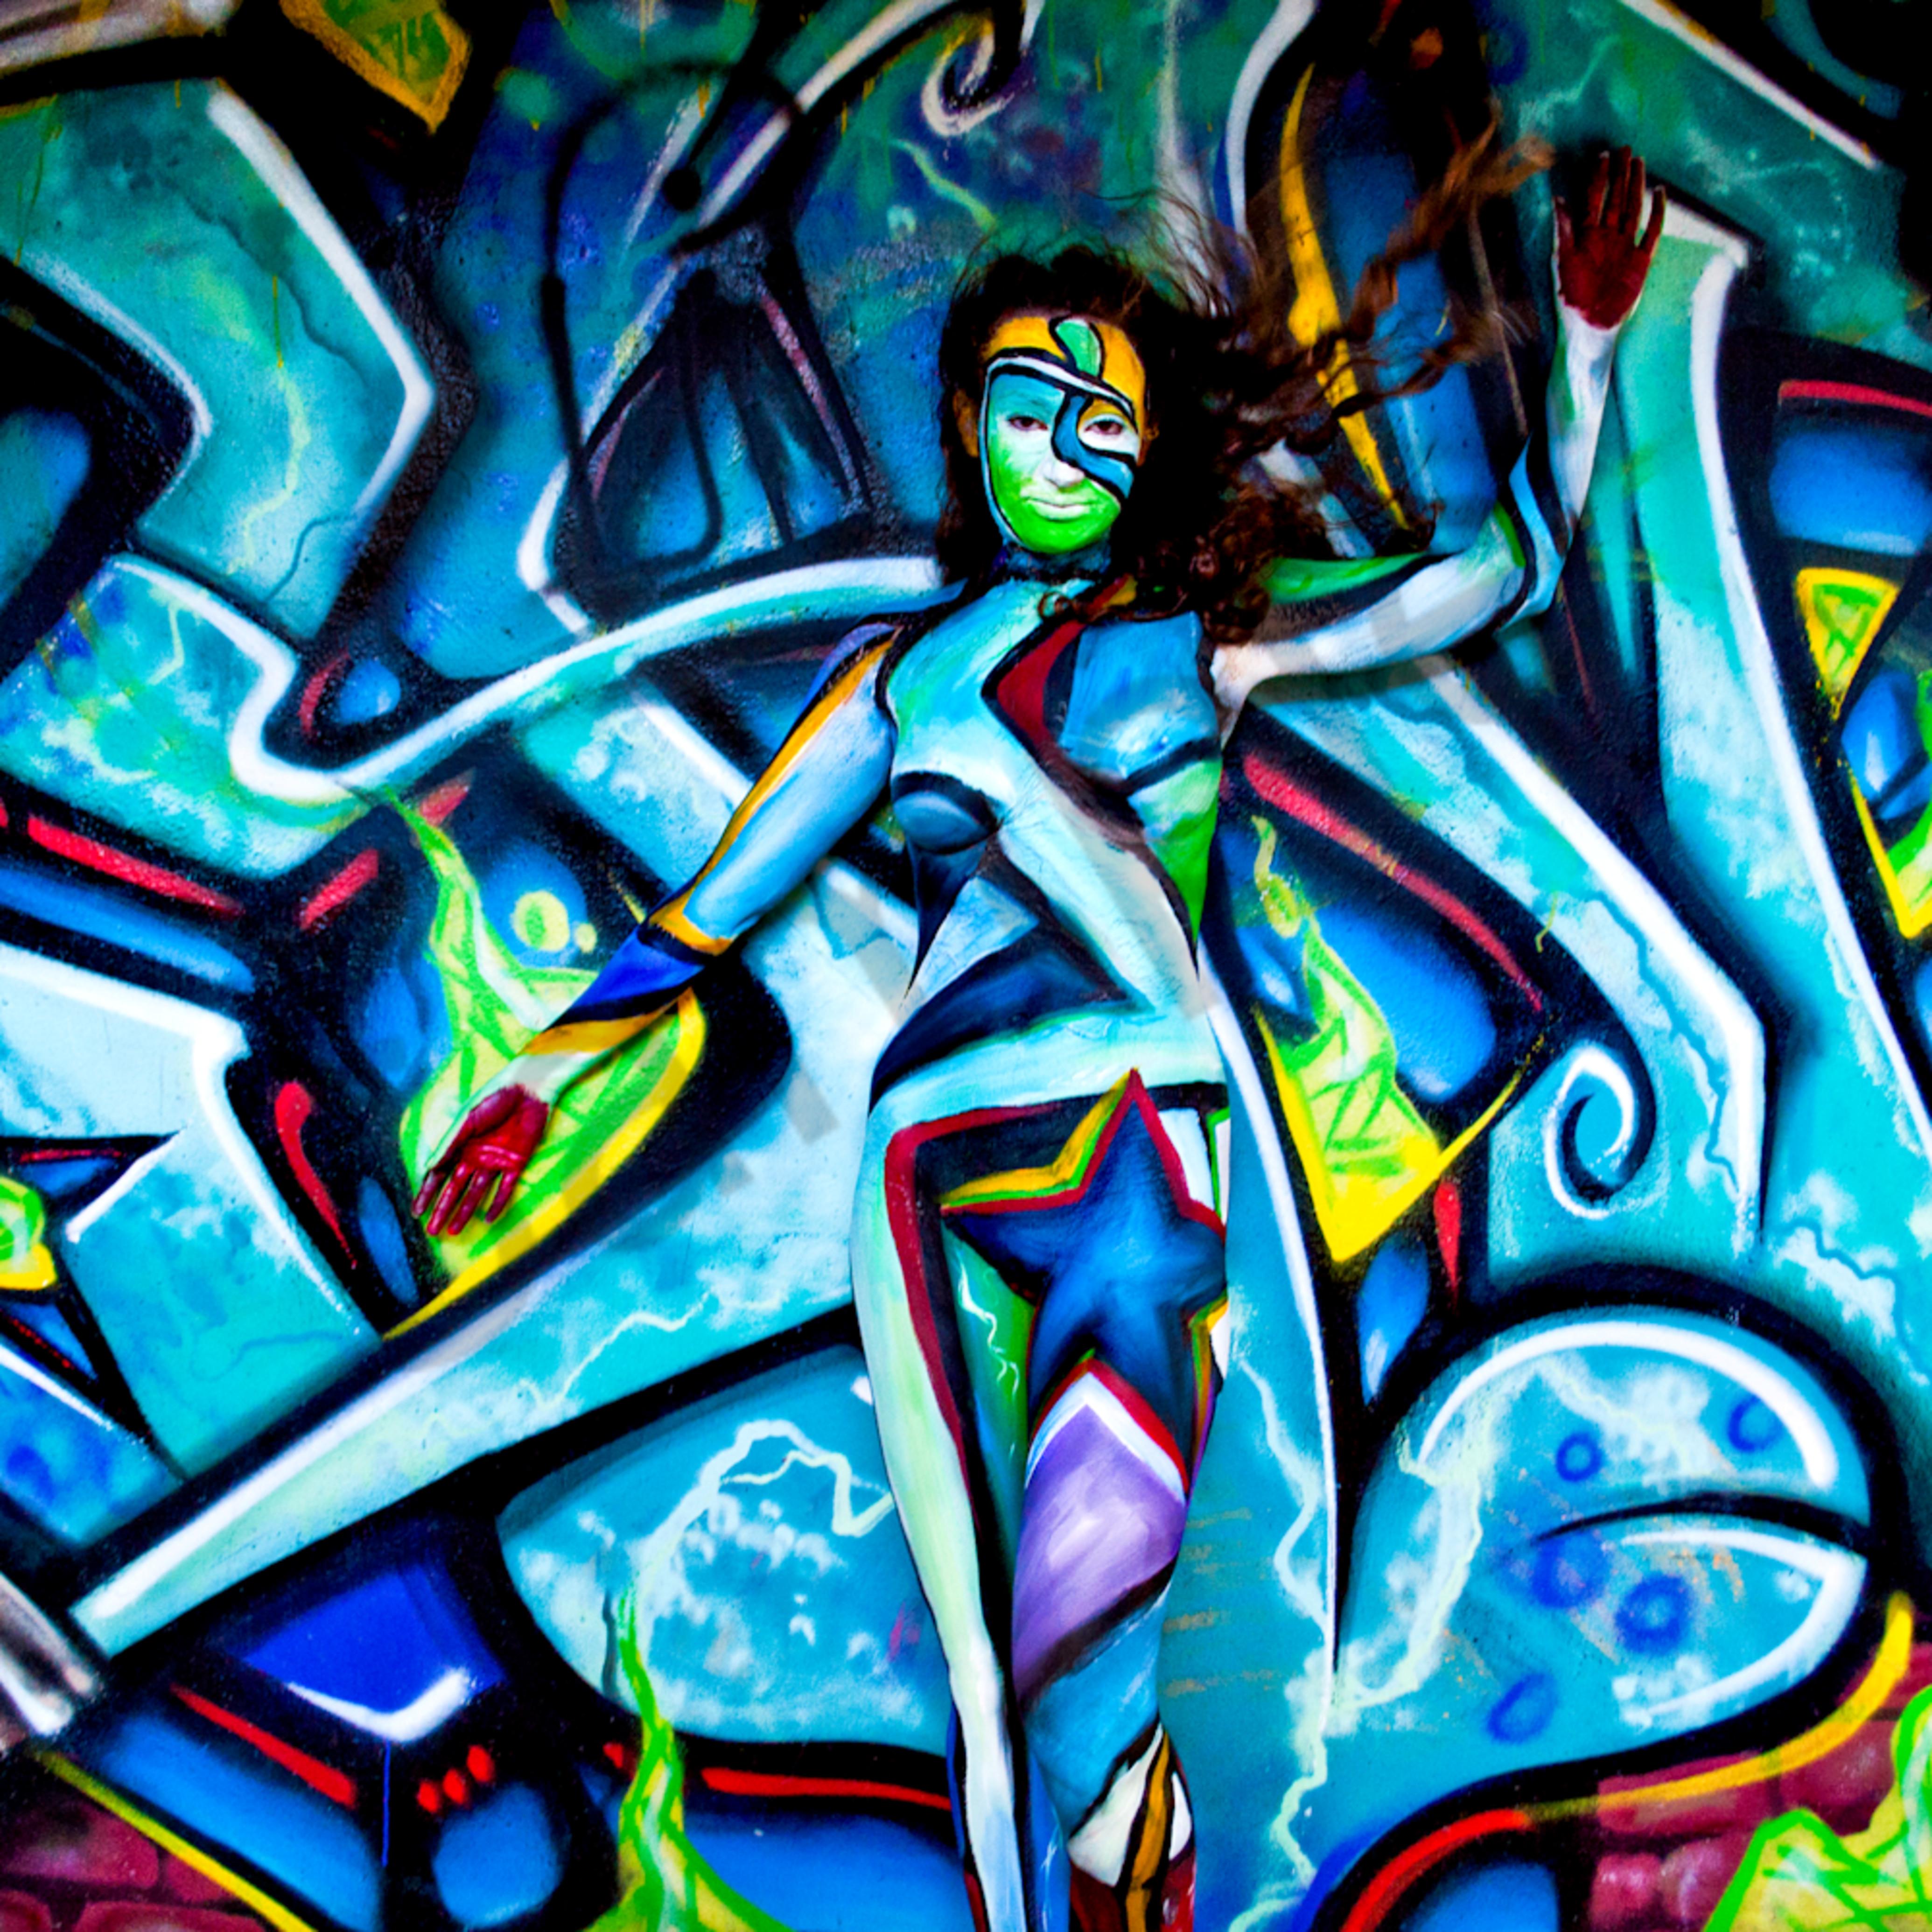 2010 wakeboardingstadiumgraffiti florida ez7cud